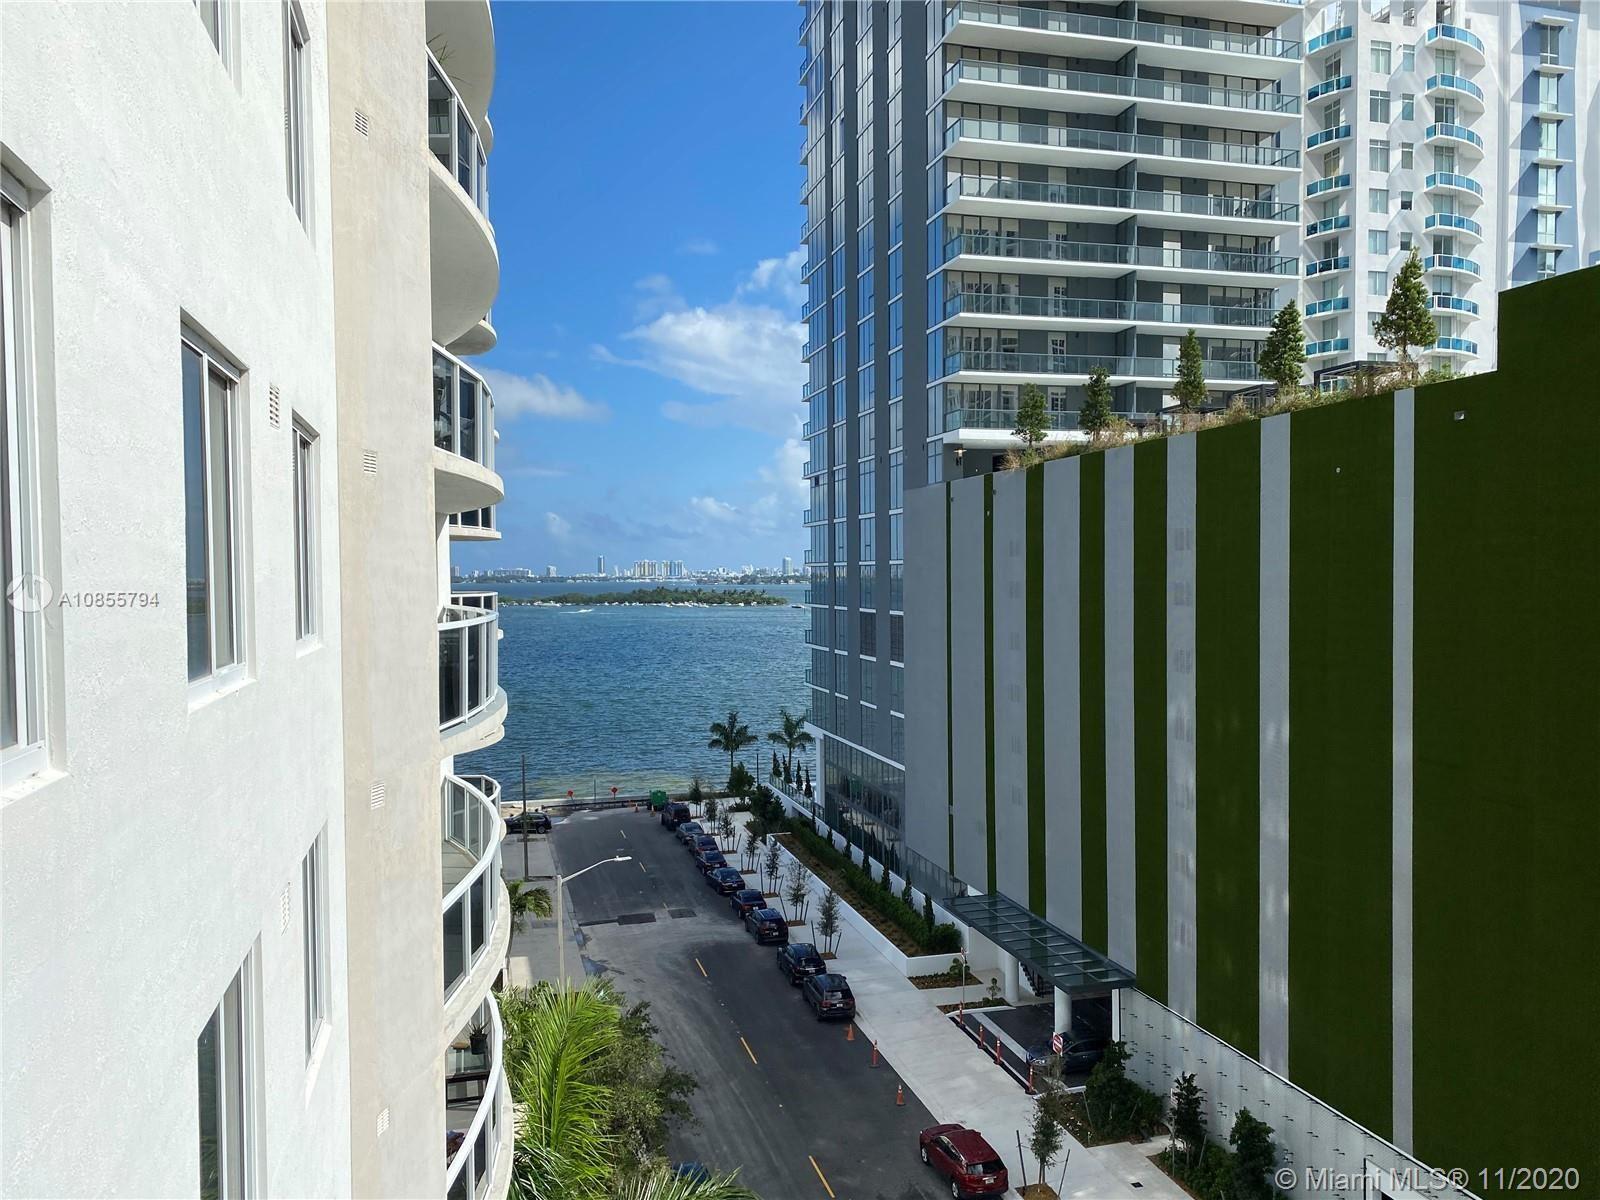 601 NE 23rd St #805, Miami, FL 33137 - #: A10855794